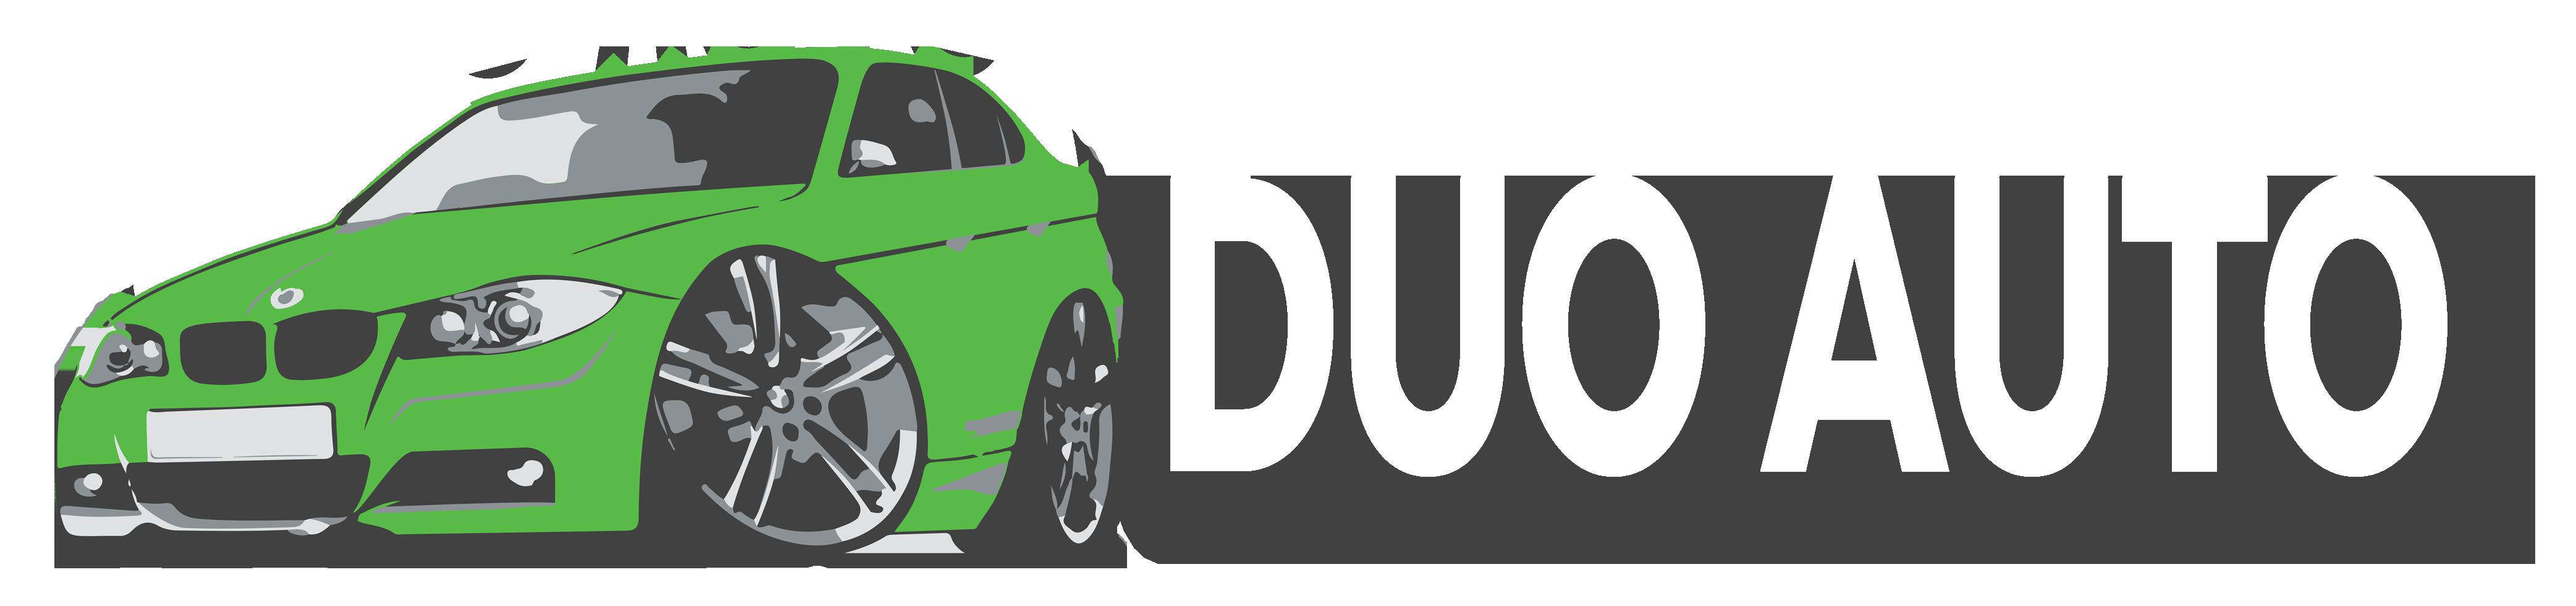 DUOAUTO